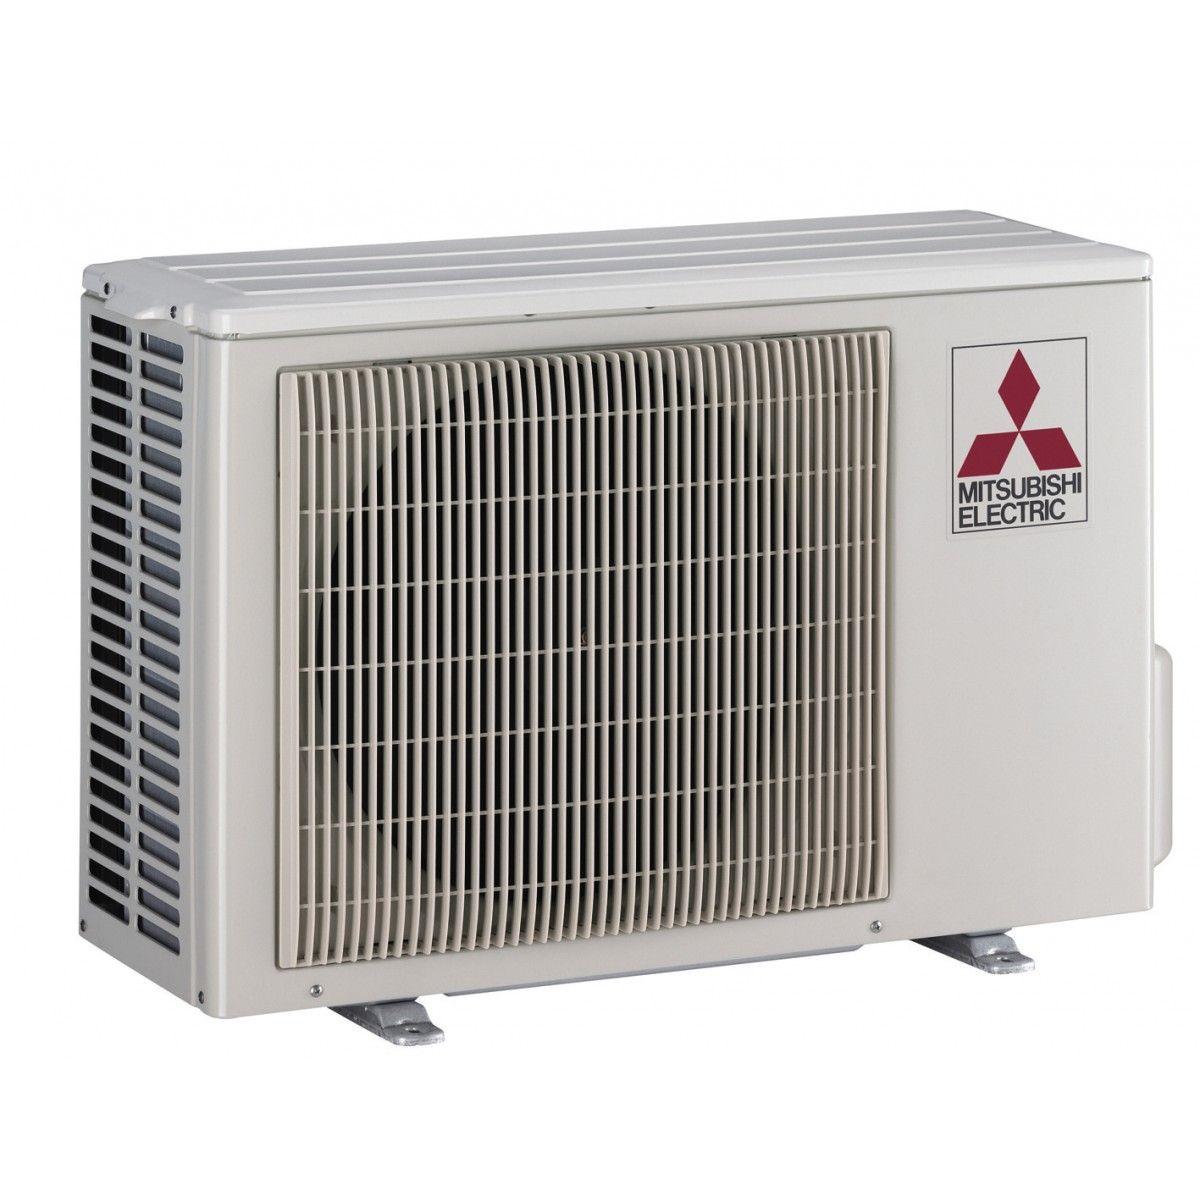 12k btu 23.1 seer mitsubishi muygl air conditioner outdoor unit in